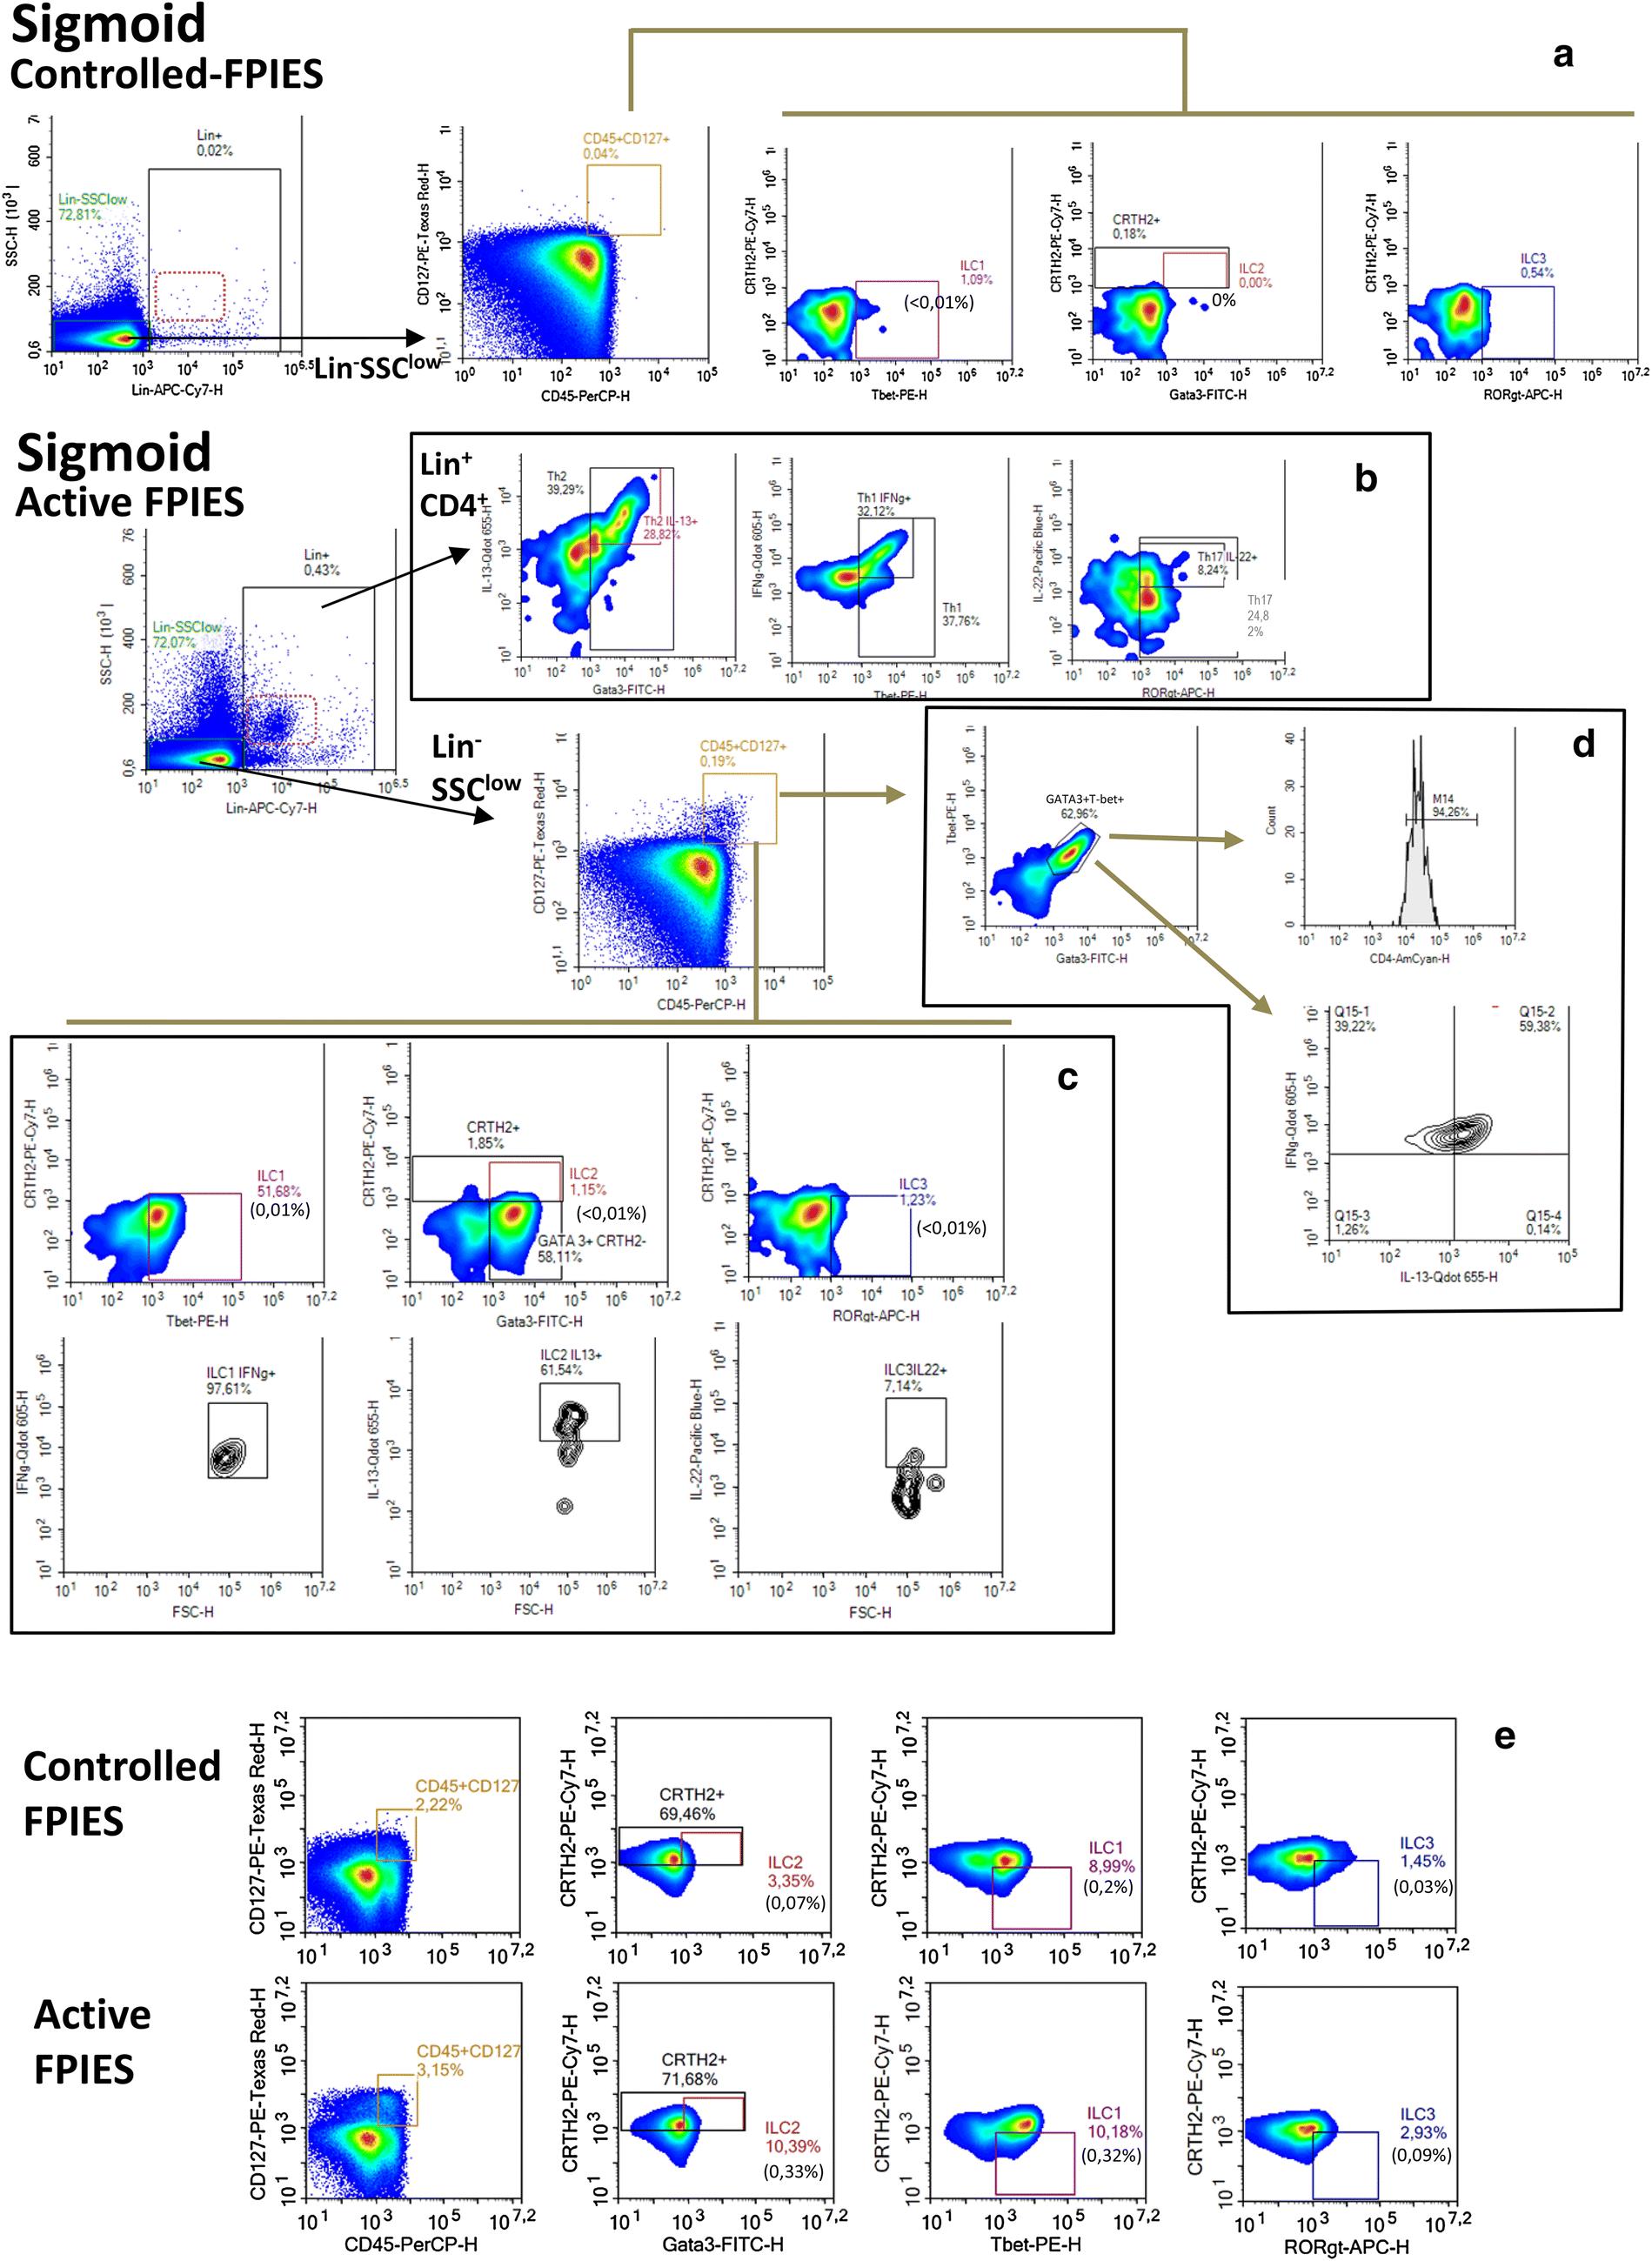 Deep Analysis Of Immune Response And Metabolic Signature In Children